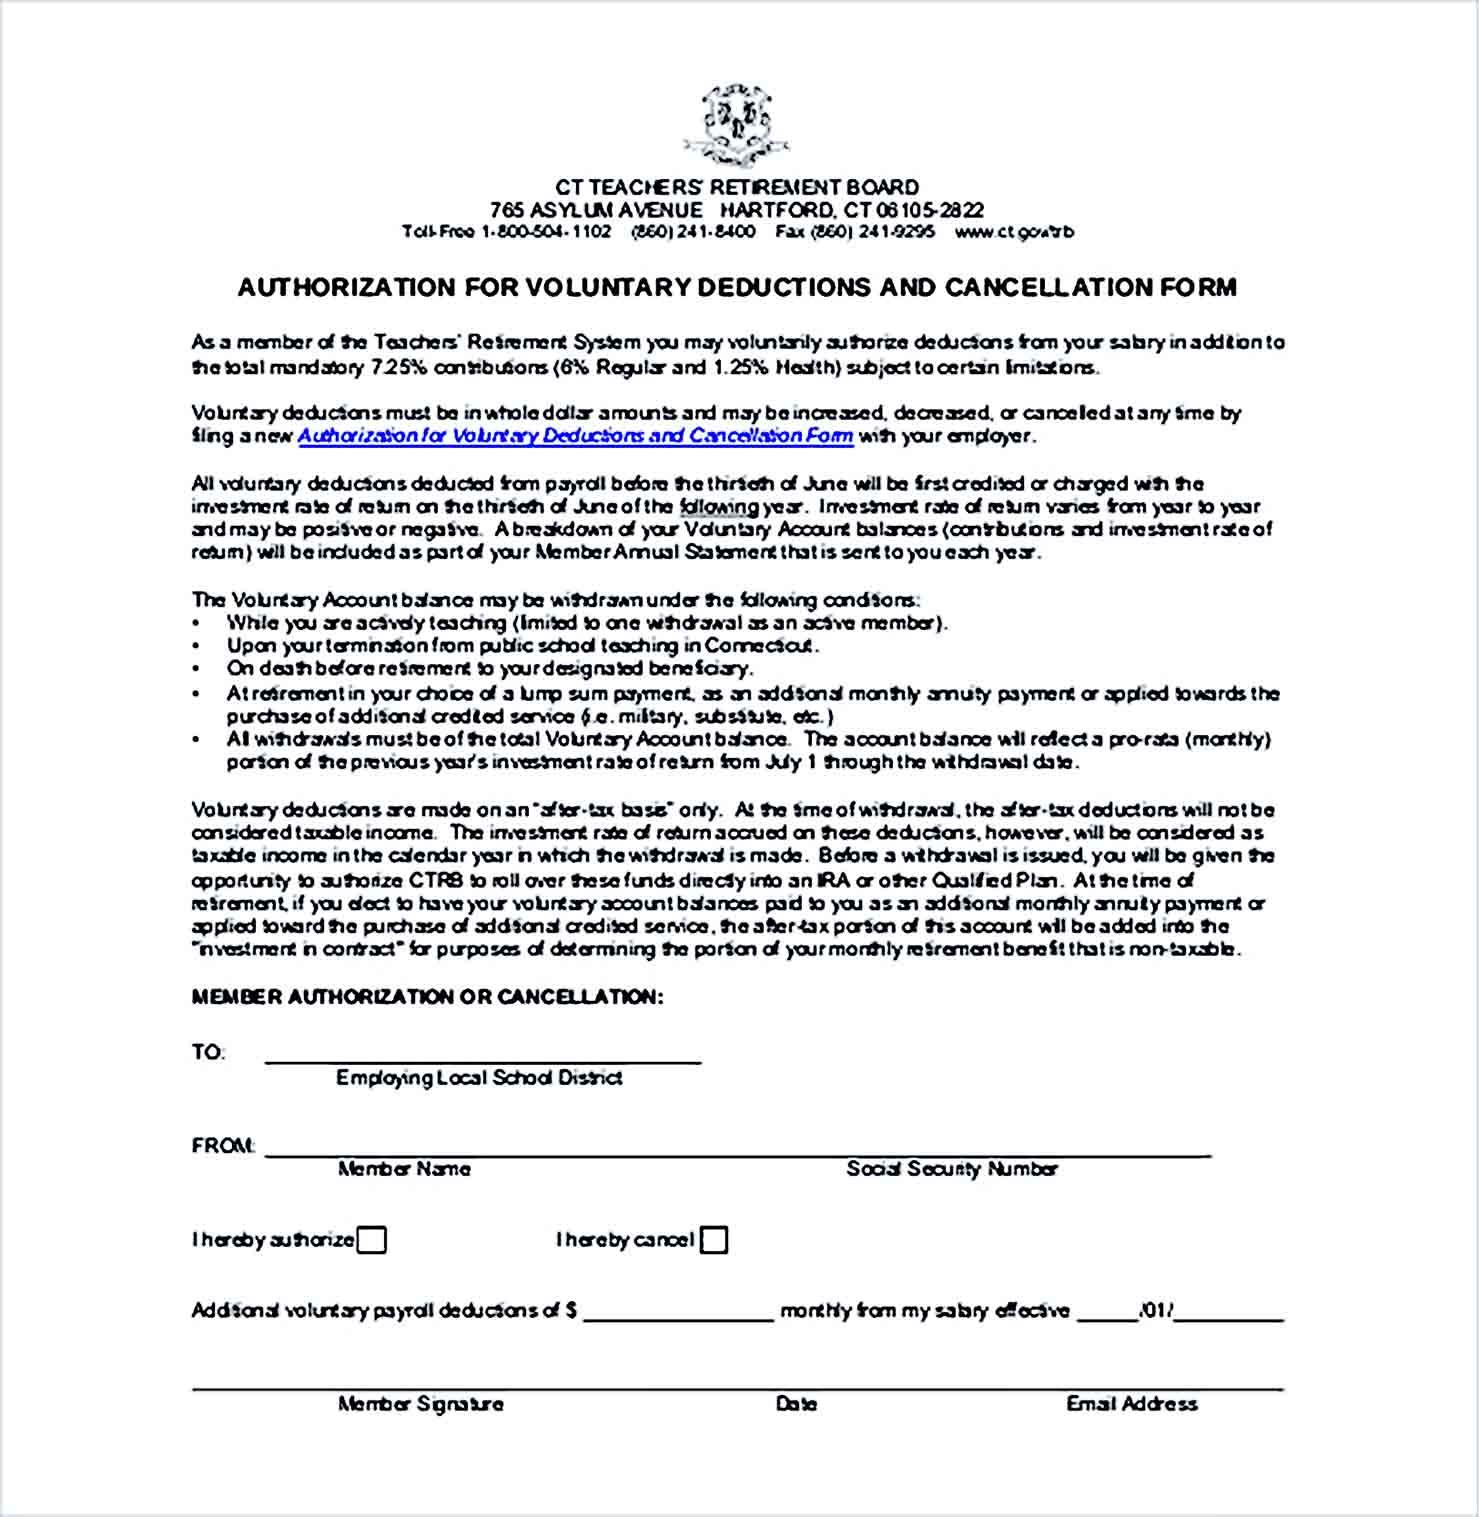 Sample Payroll Budger Deduction Agreement